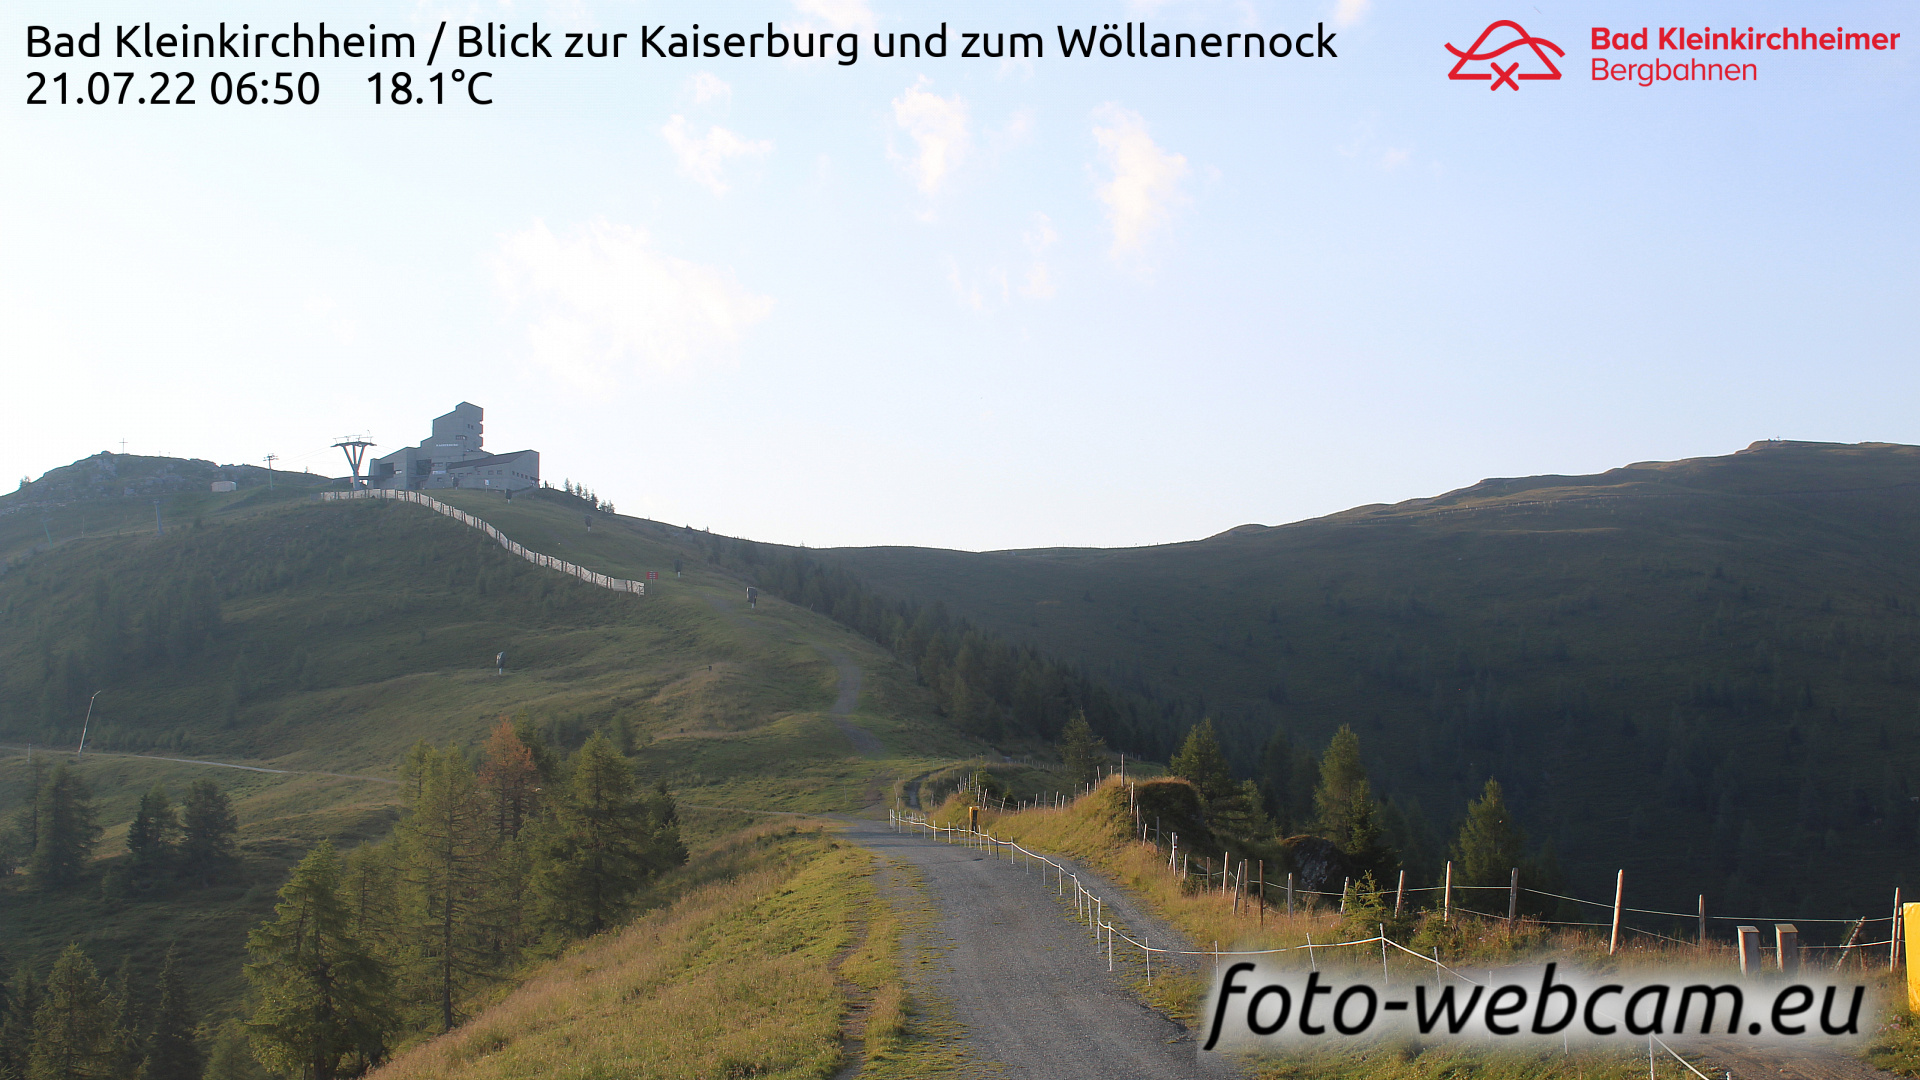 Bad Kleinkirchheim Thu. 06:23